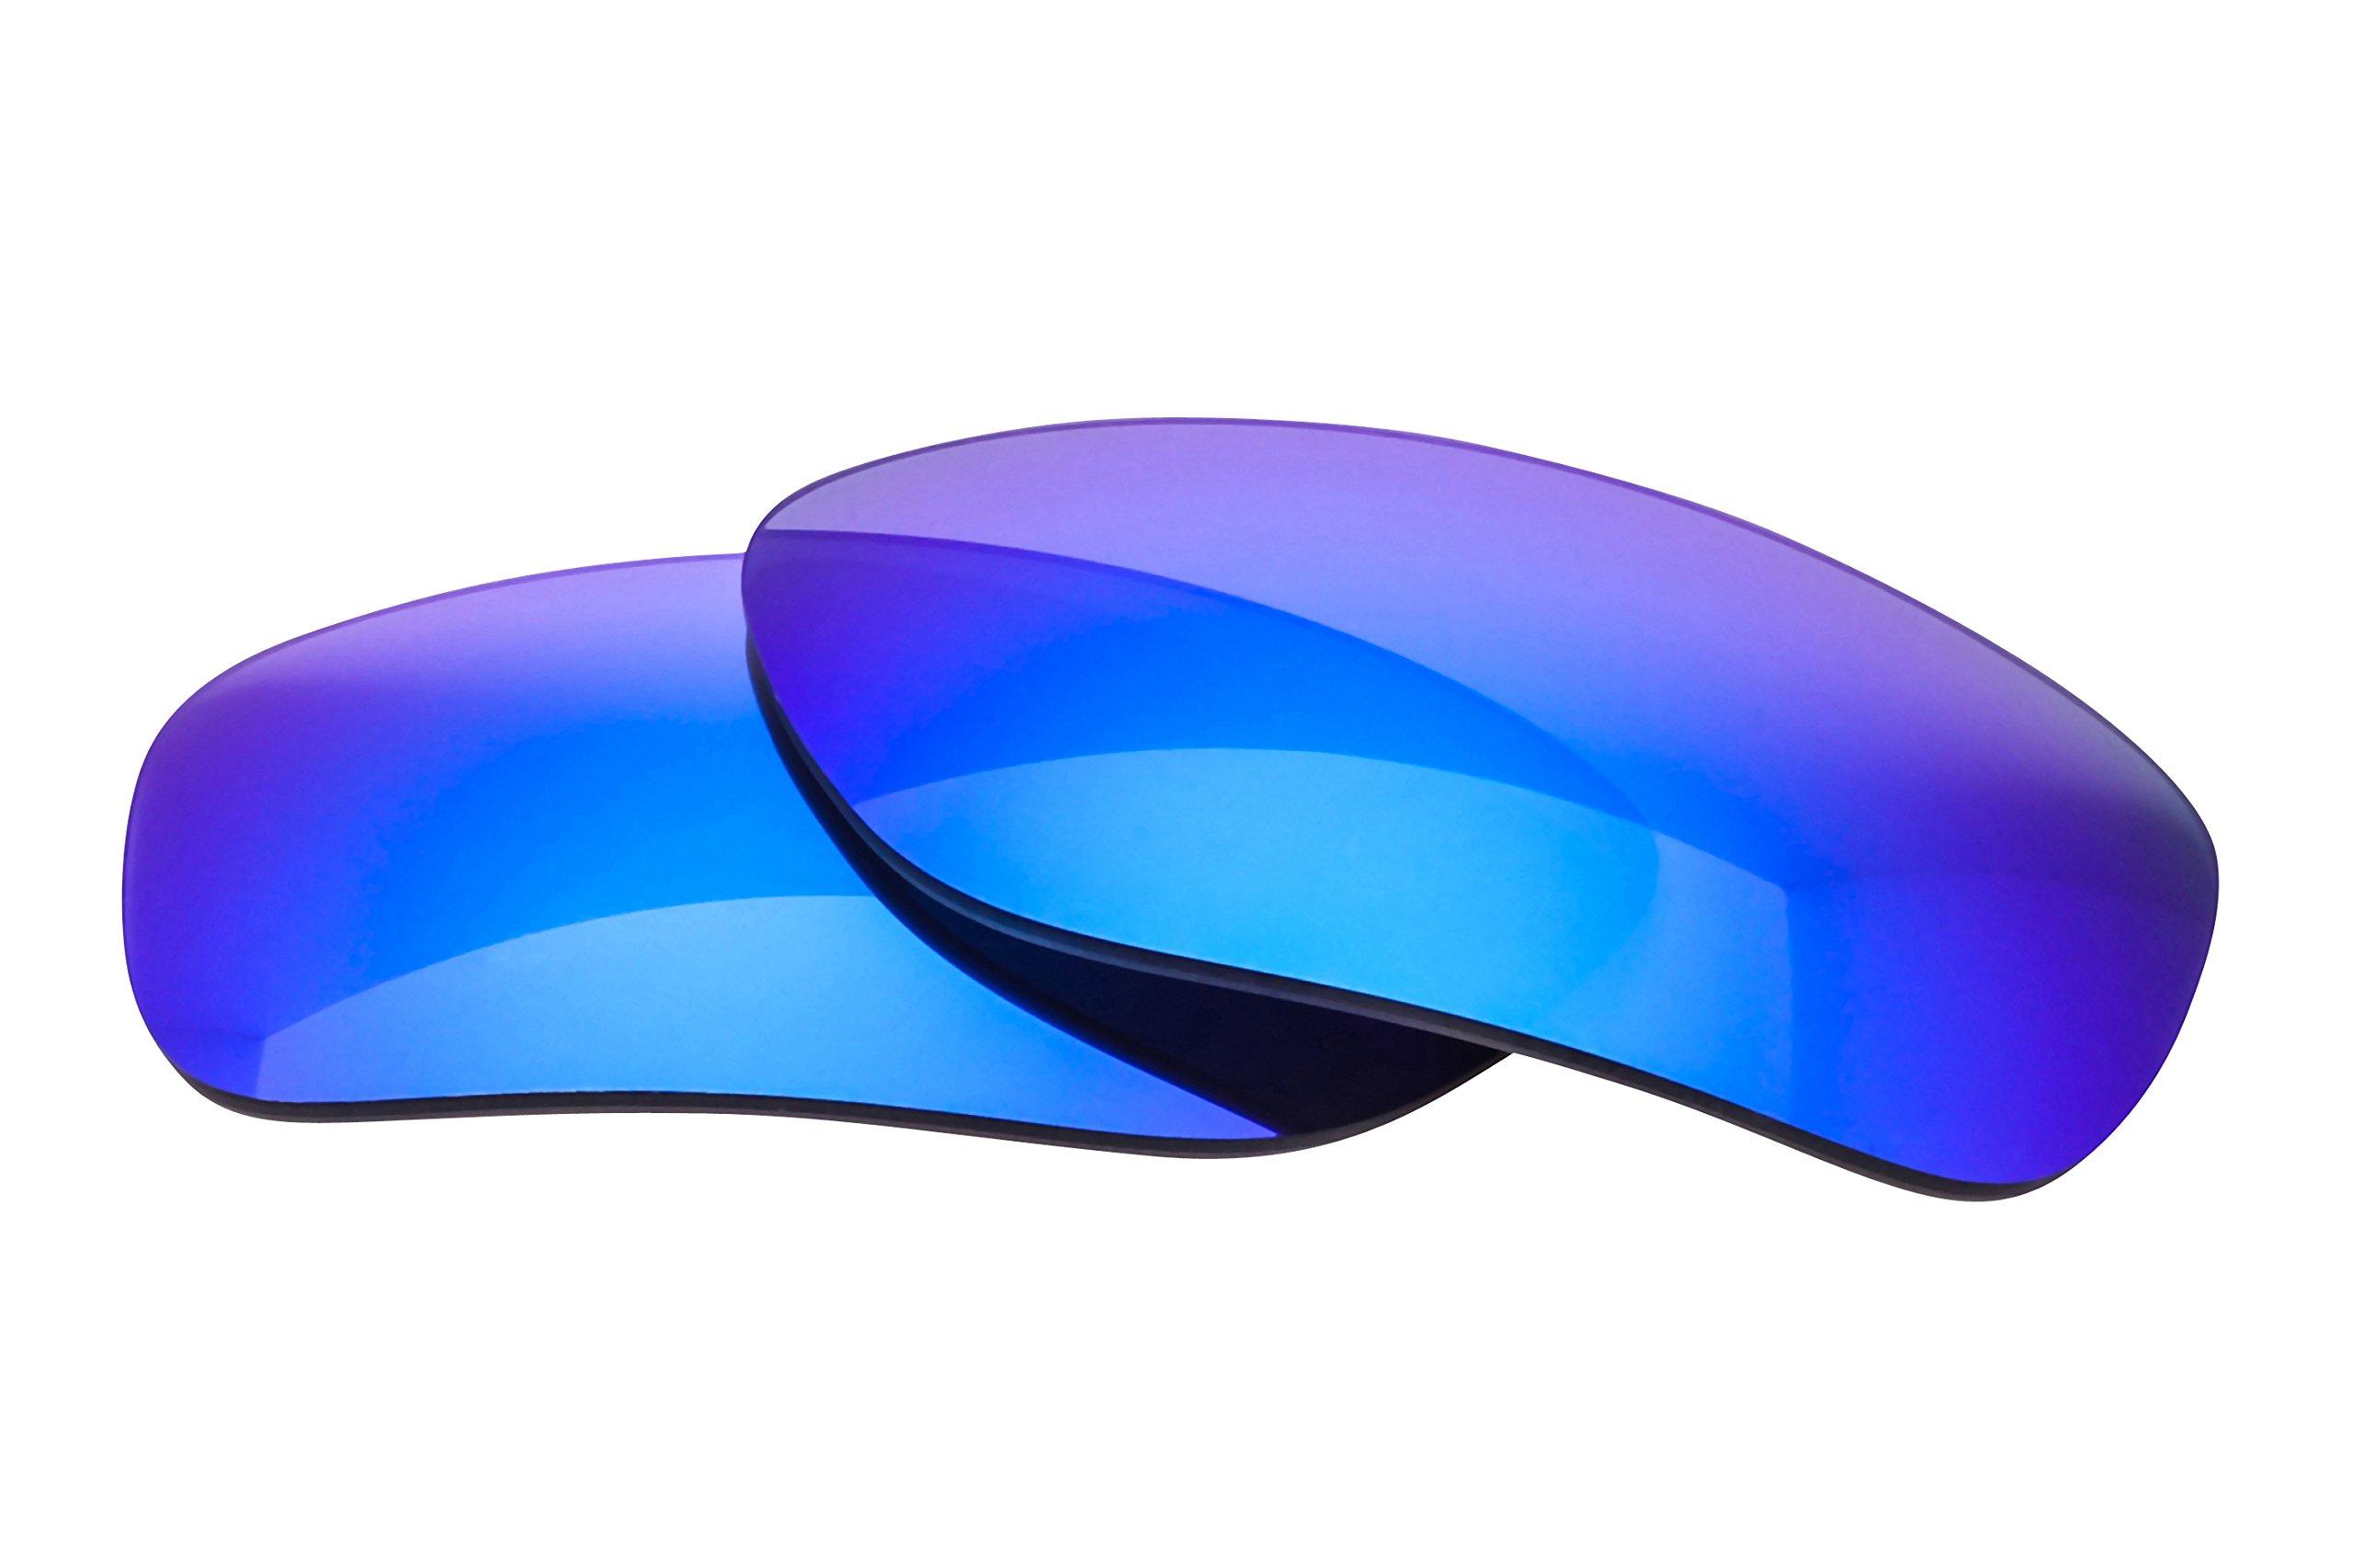 LenzFlip Polarized Lens Replacement REVO Heading Sunglass - Gray Polarized with Blue Mirror Lenses